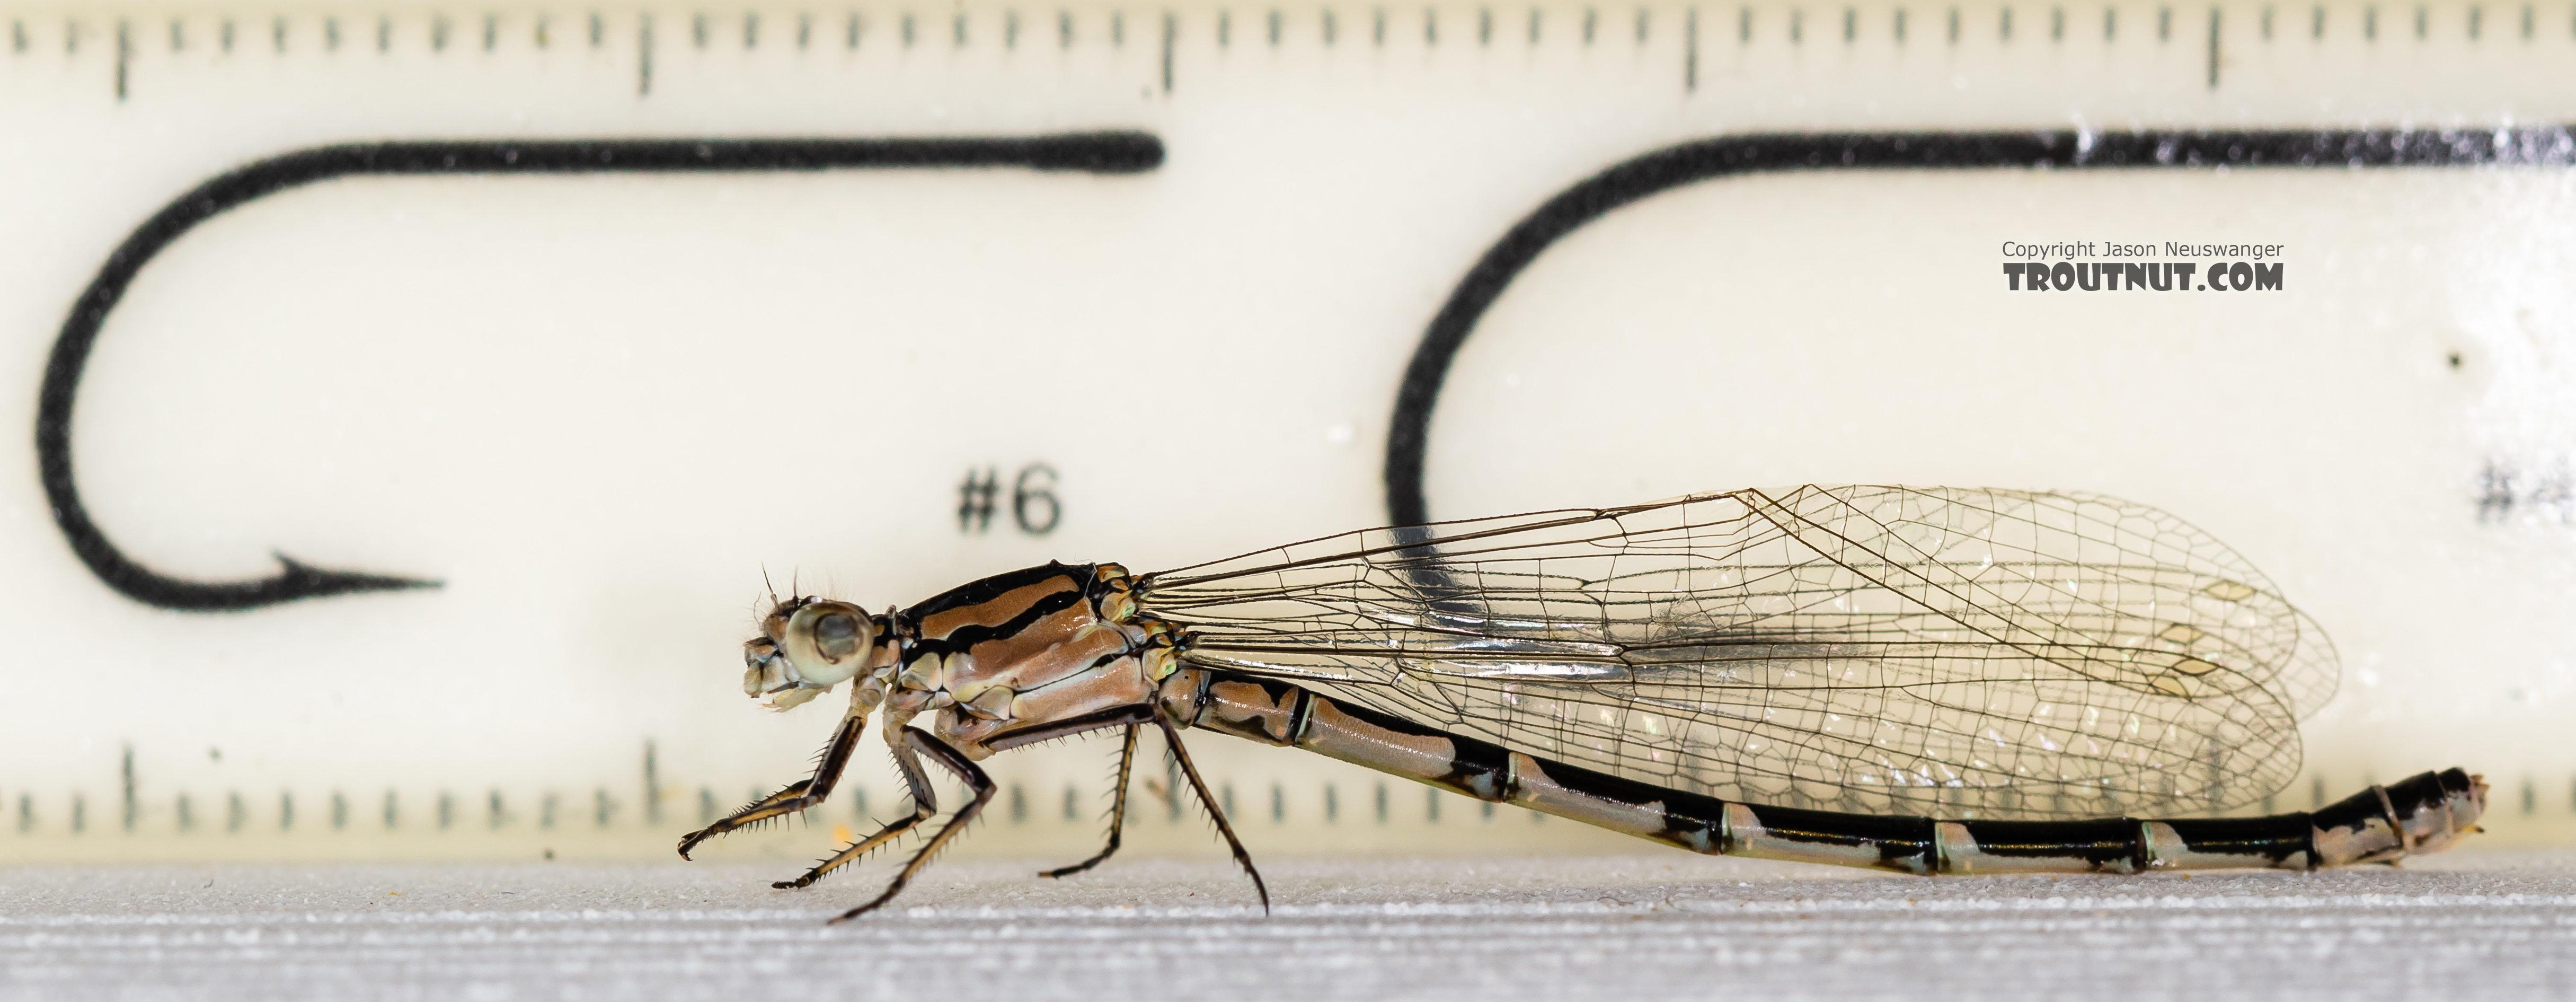 Odonata-Zygoptera (Damselflies) Damselfly Adult from the Madison River in Montana